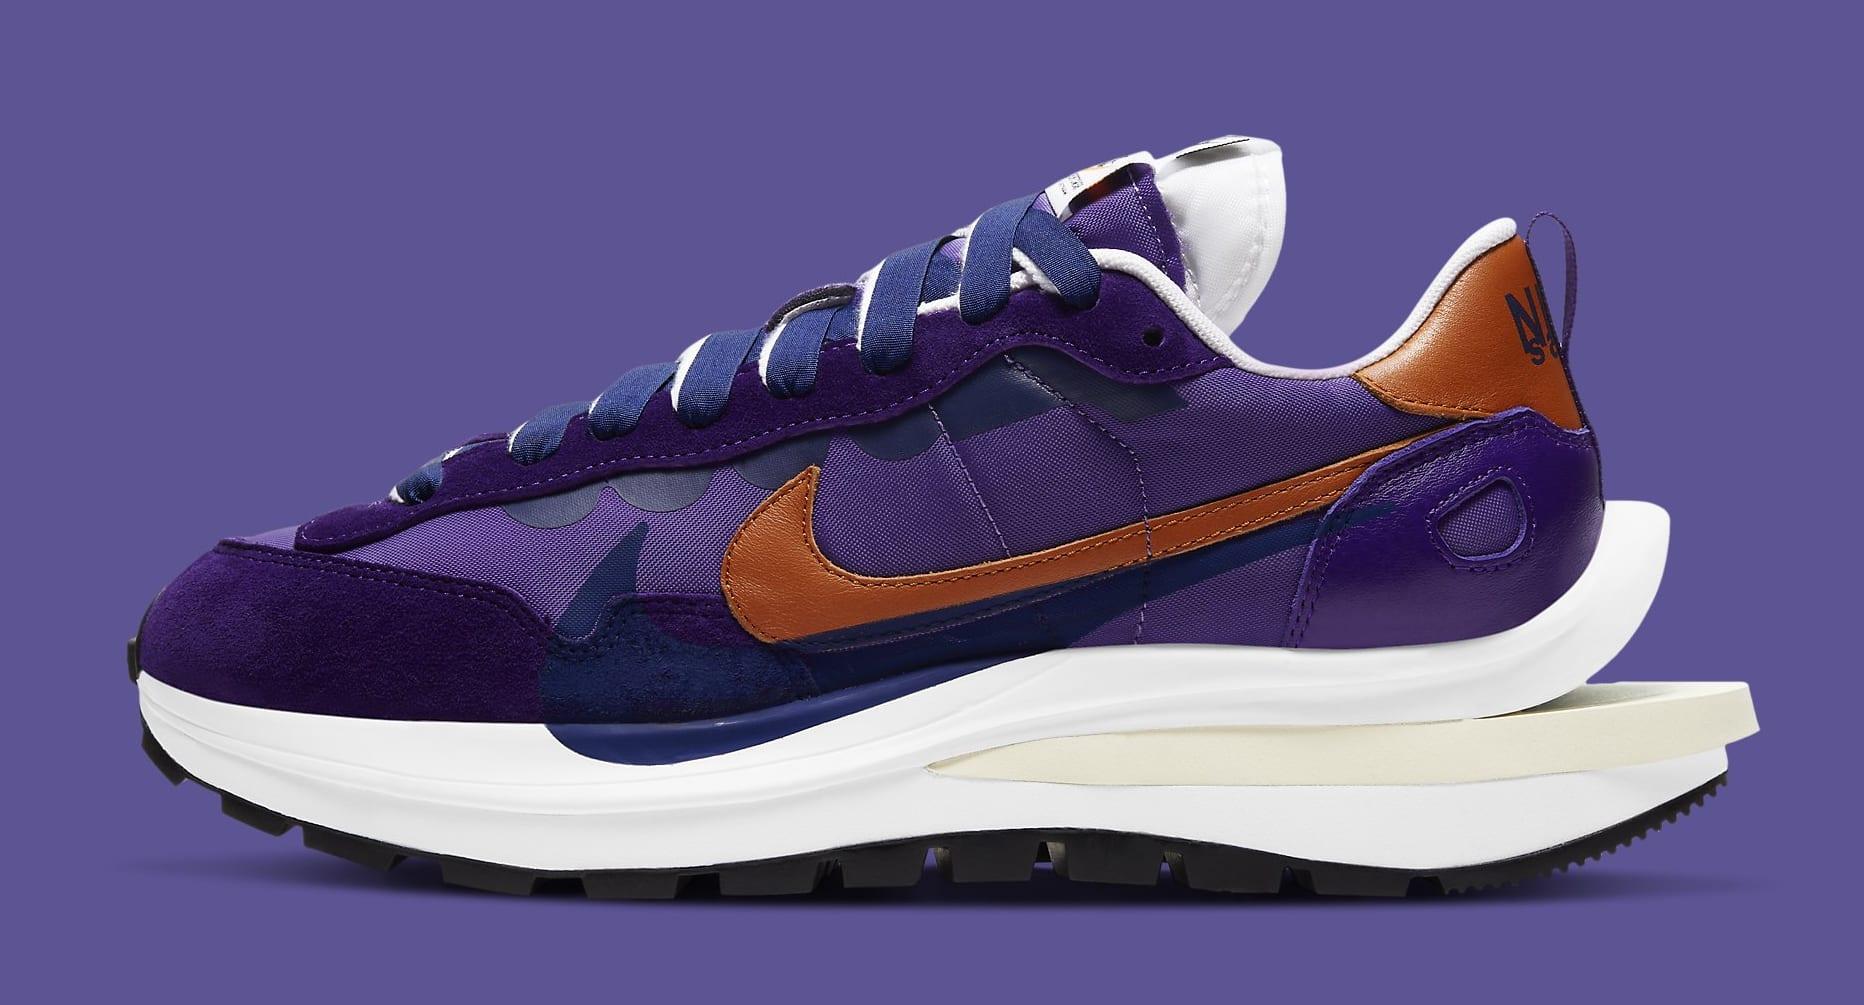 Sacai x Nike VaporWaffle 'Dark Iris' DD1875-500 Lateral